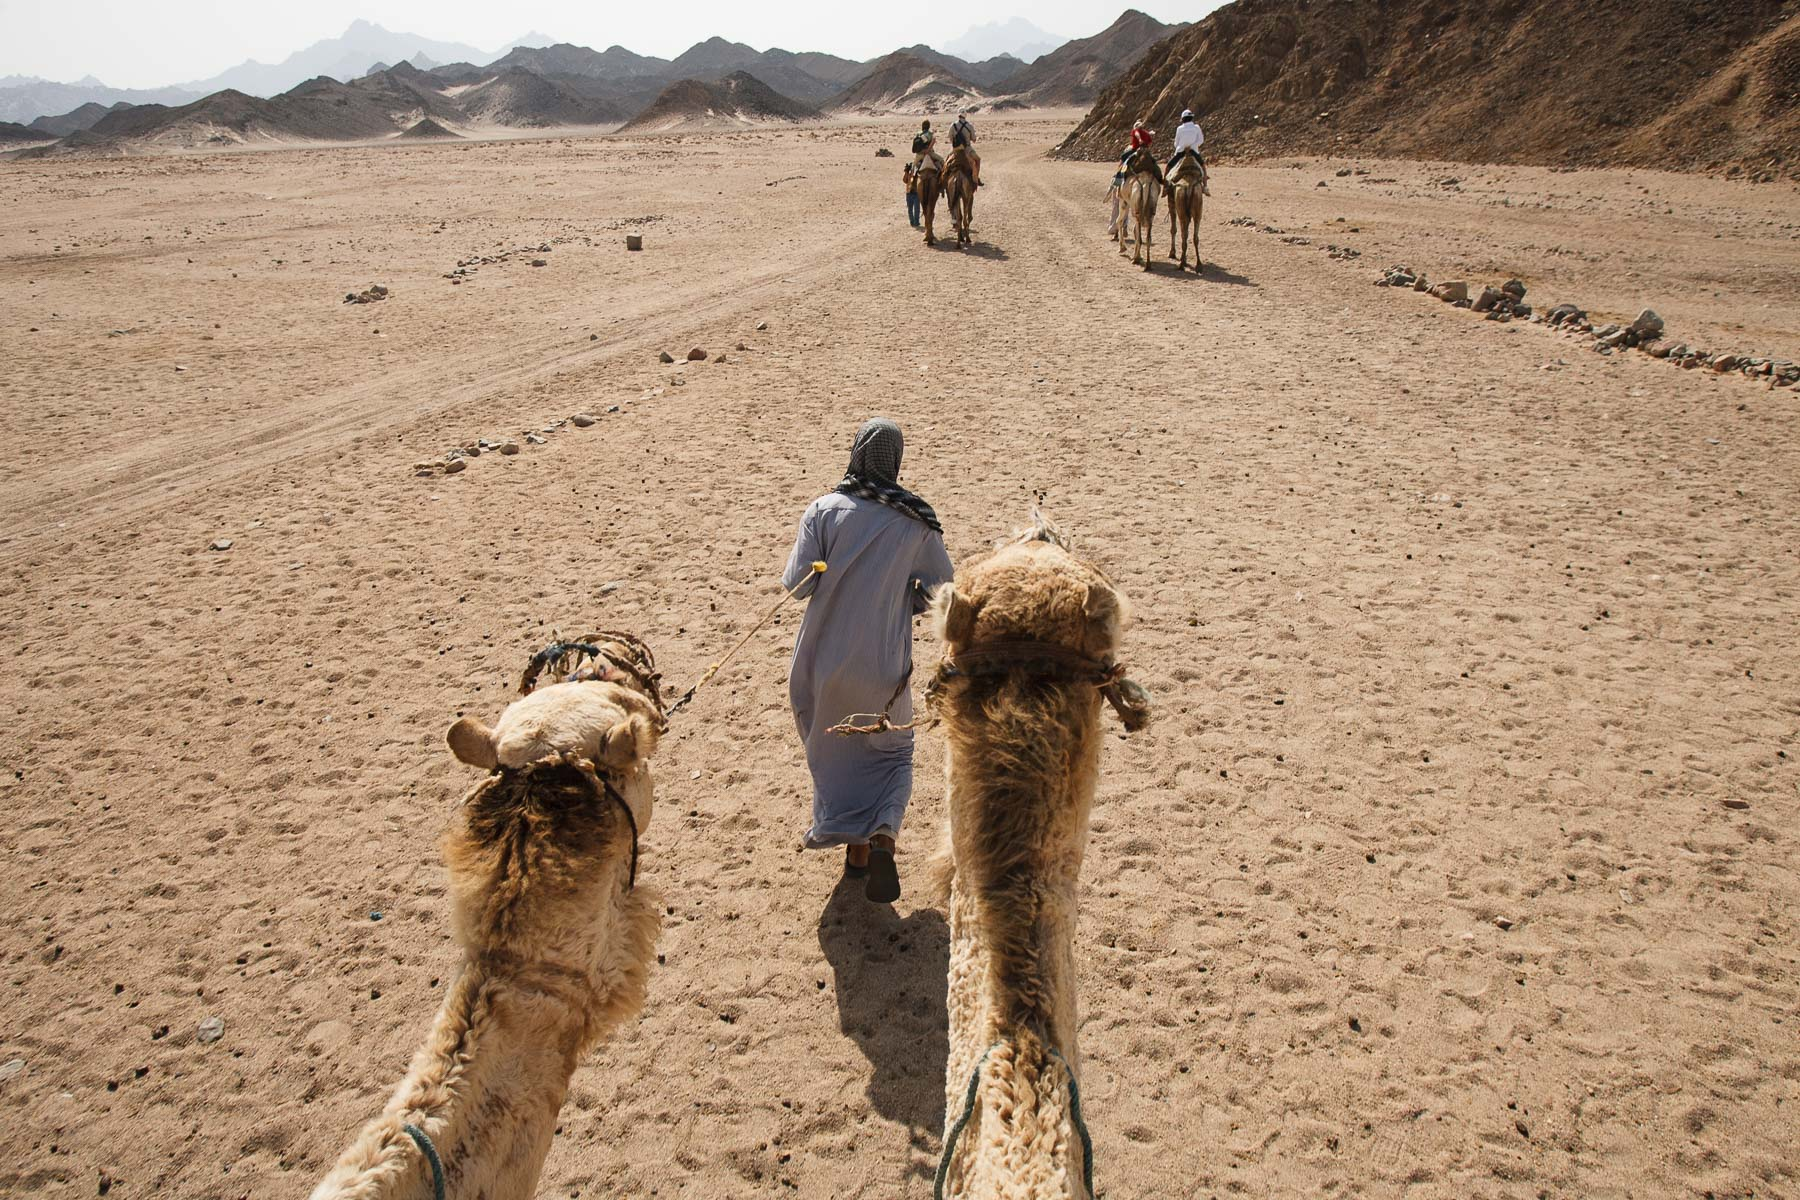 The Beduin village near Hurghada